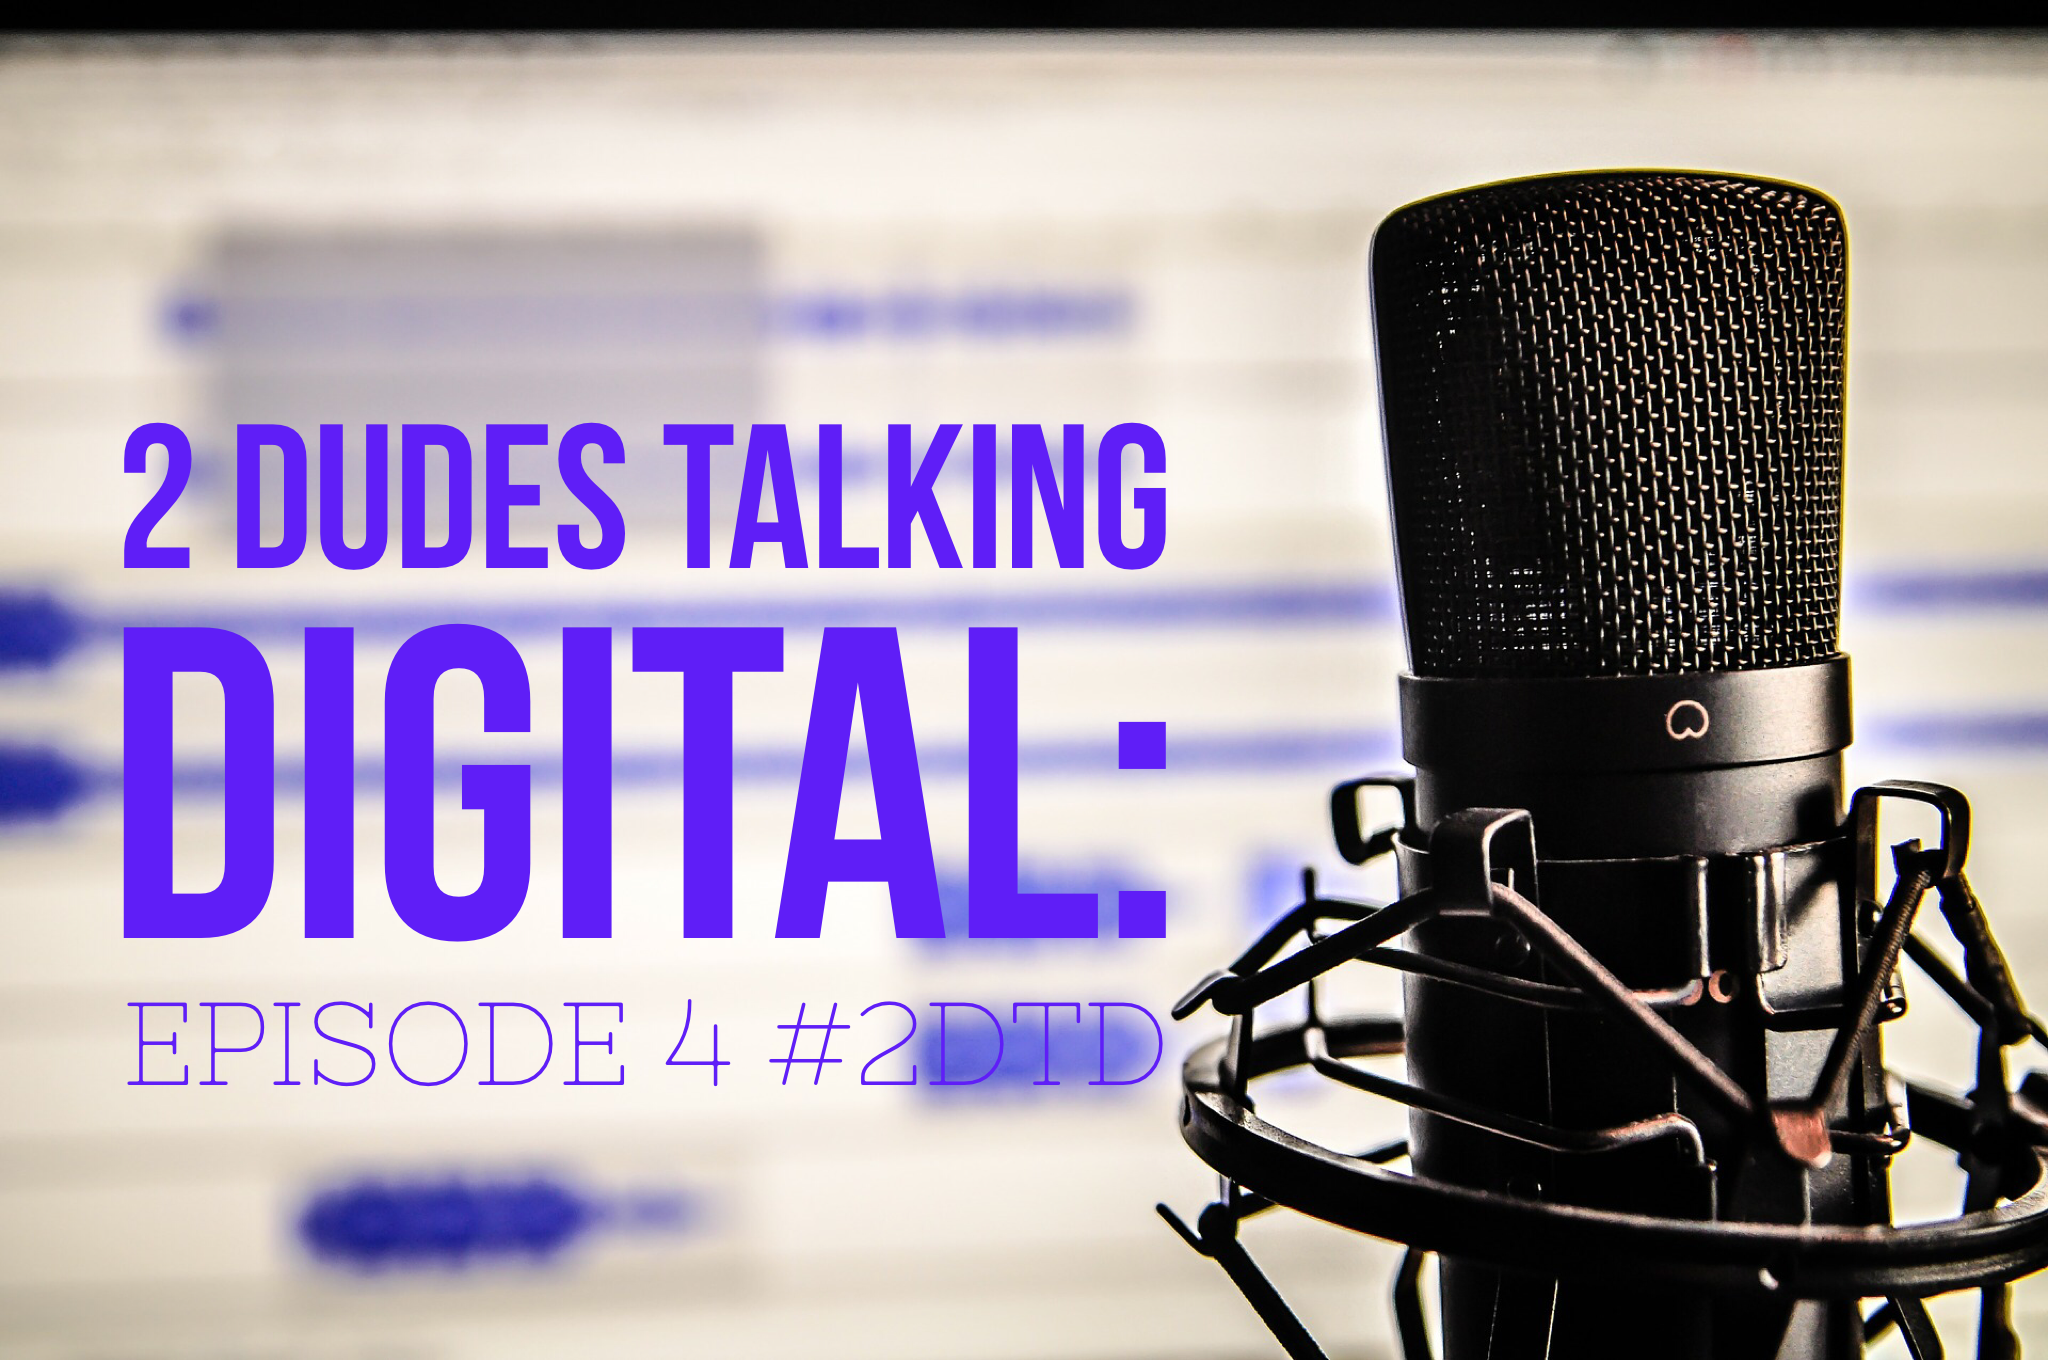 2 Dudes Talking Digital Episode 4 Graphic